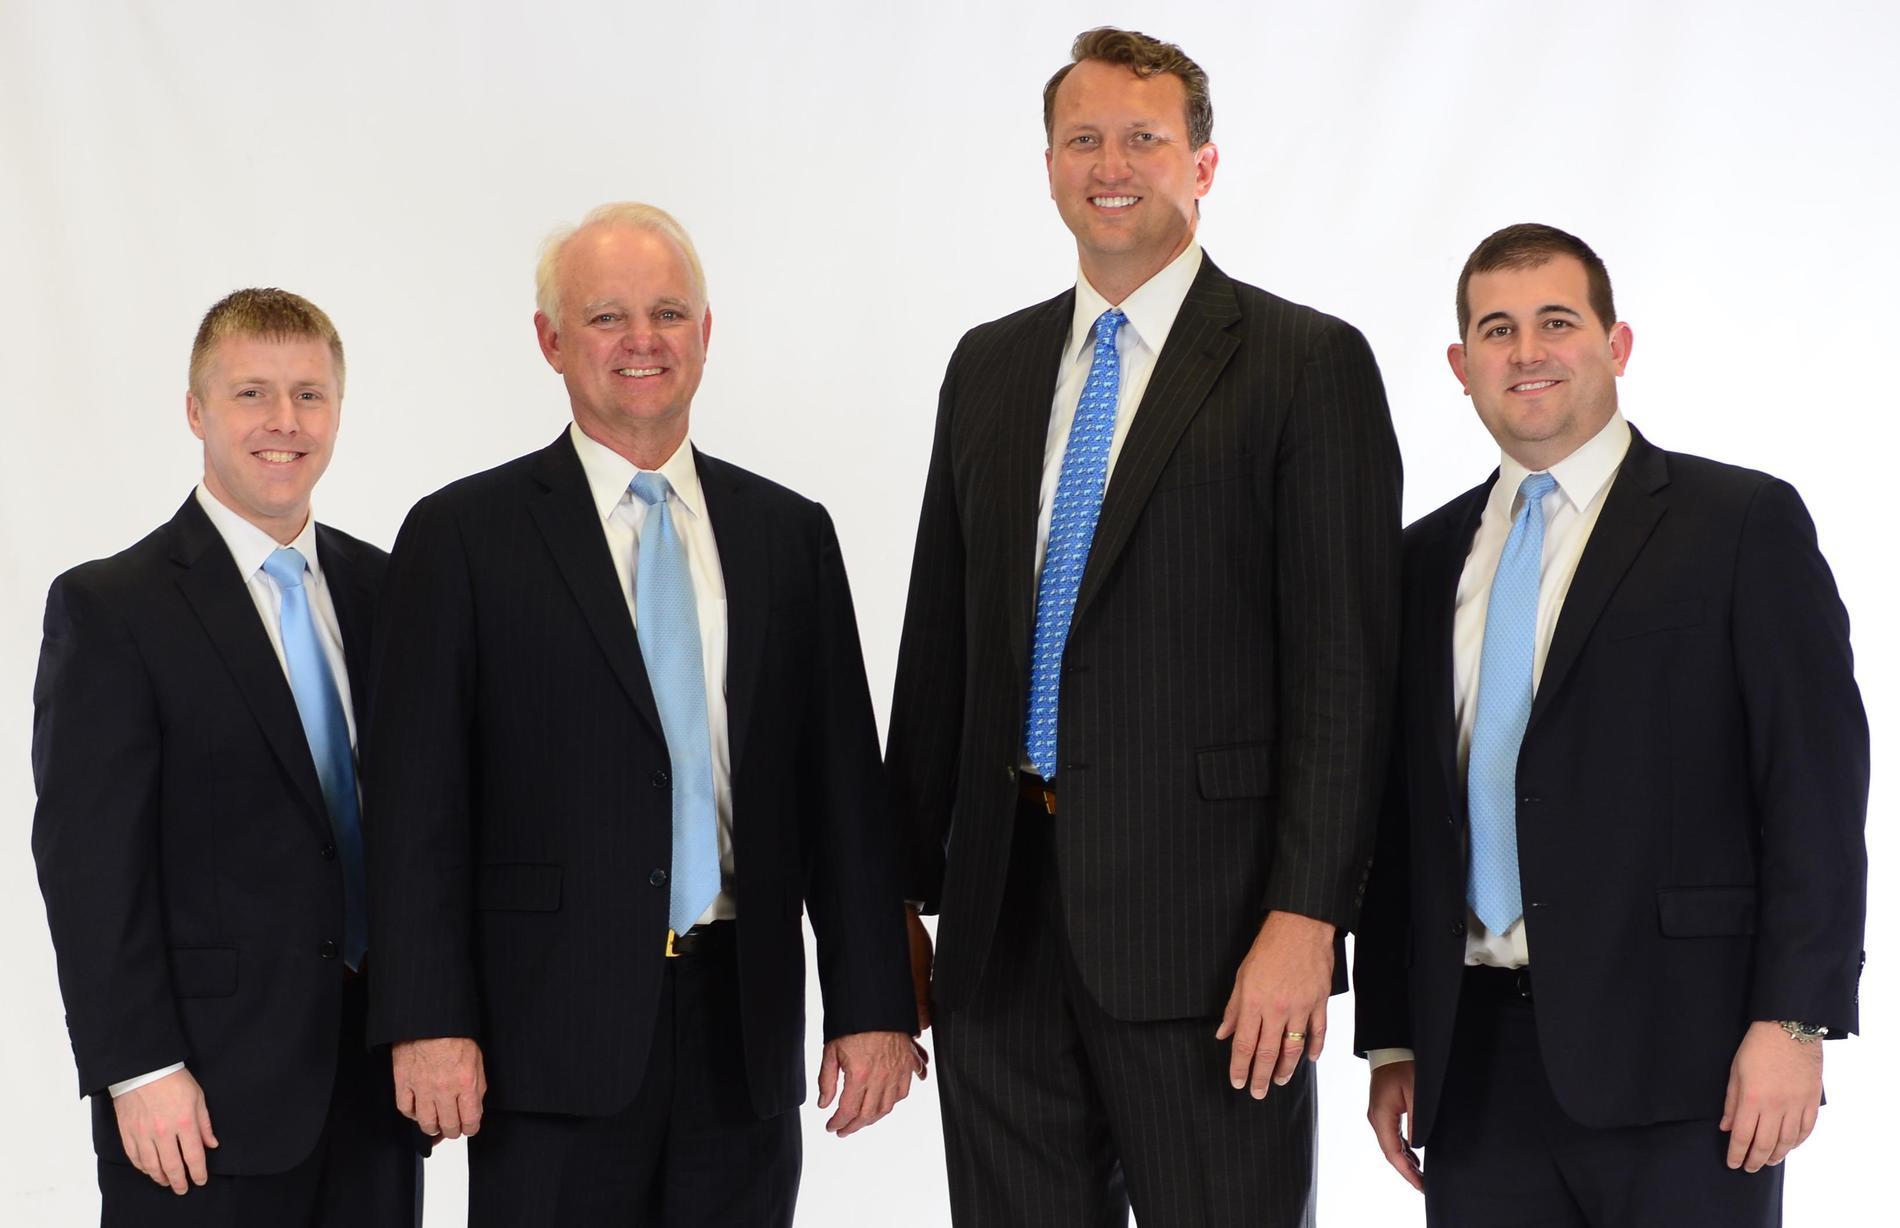 The Hale Group | Beavercreek, OH | Morgan Stanley Wealth